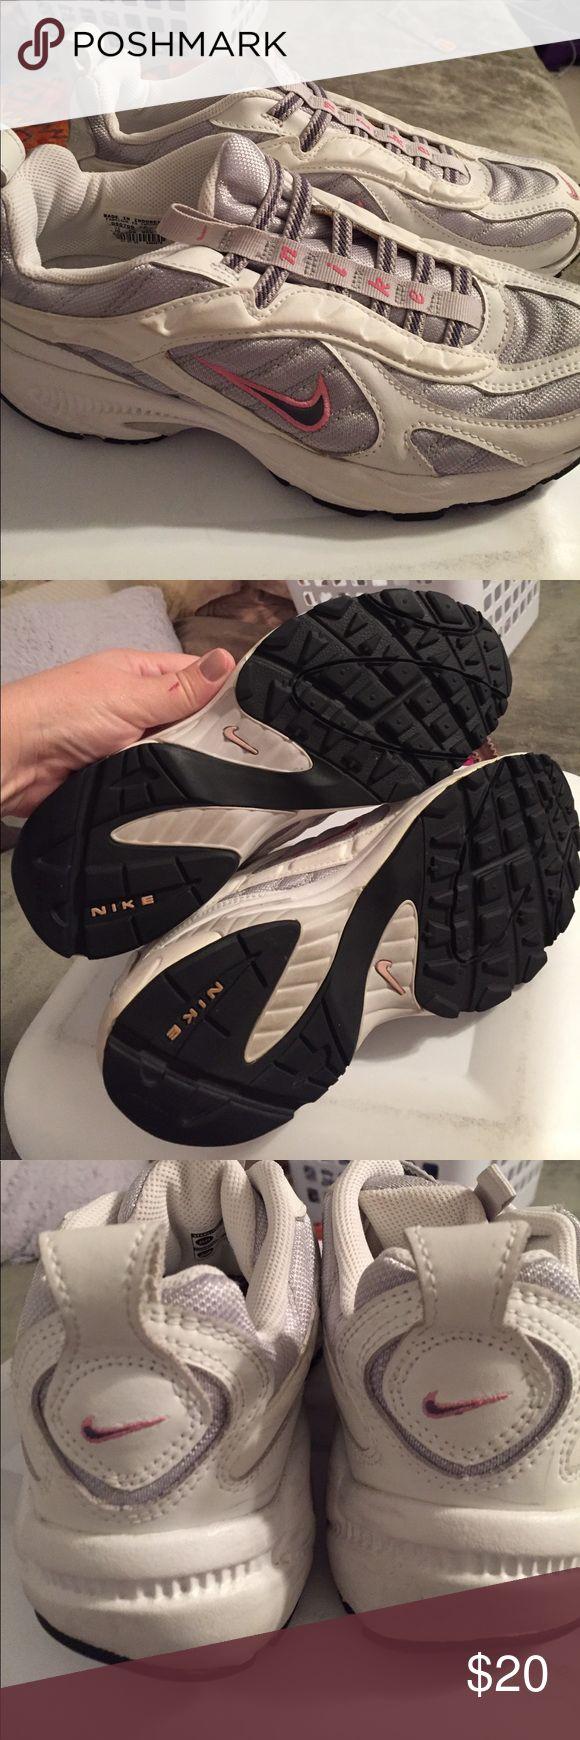 Nike slip on tennis shoes White & pink slip on tennis shoes, hardly worn Nike Shoes Athletic Shoes